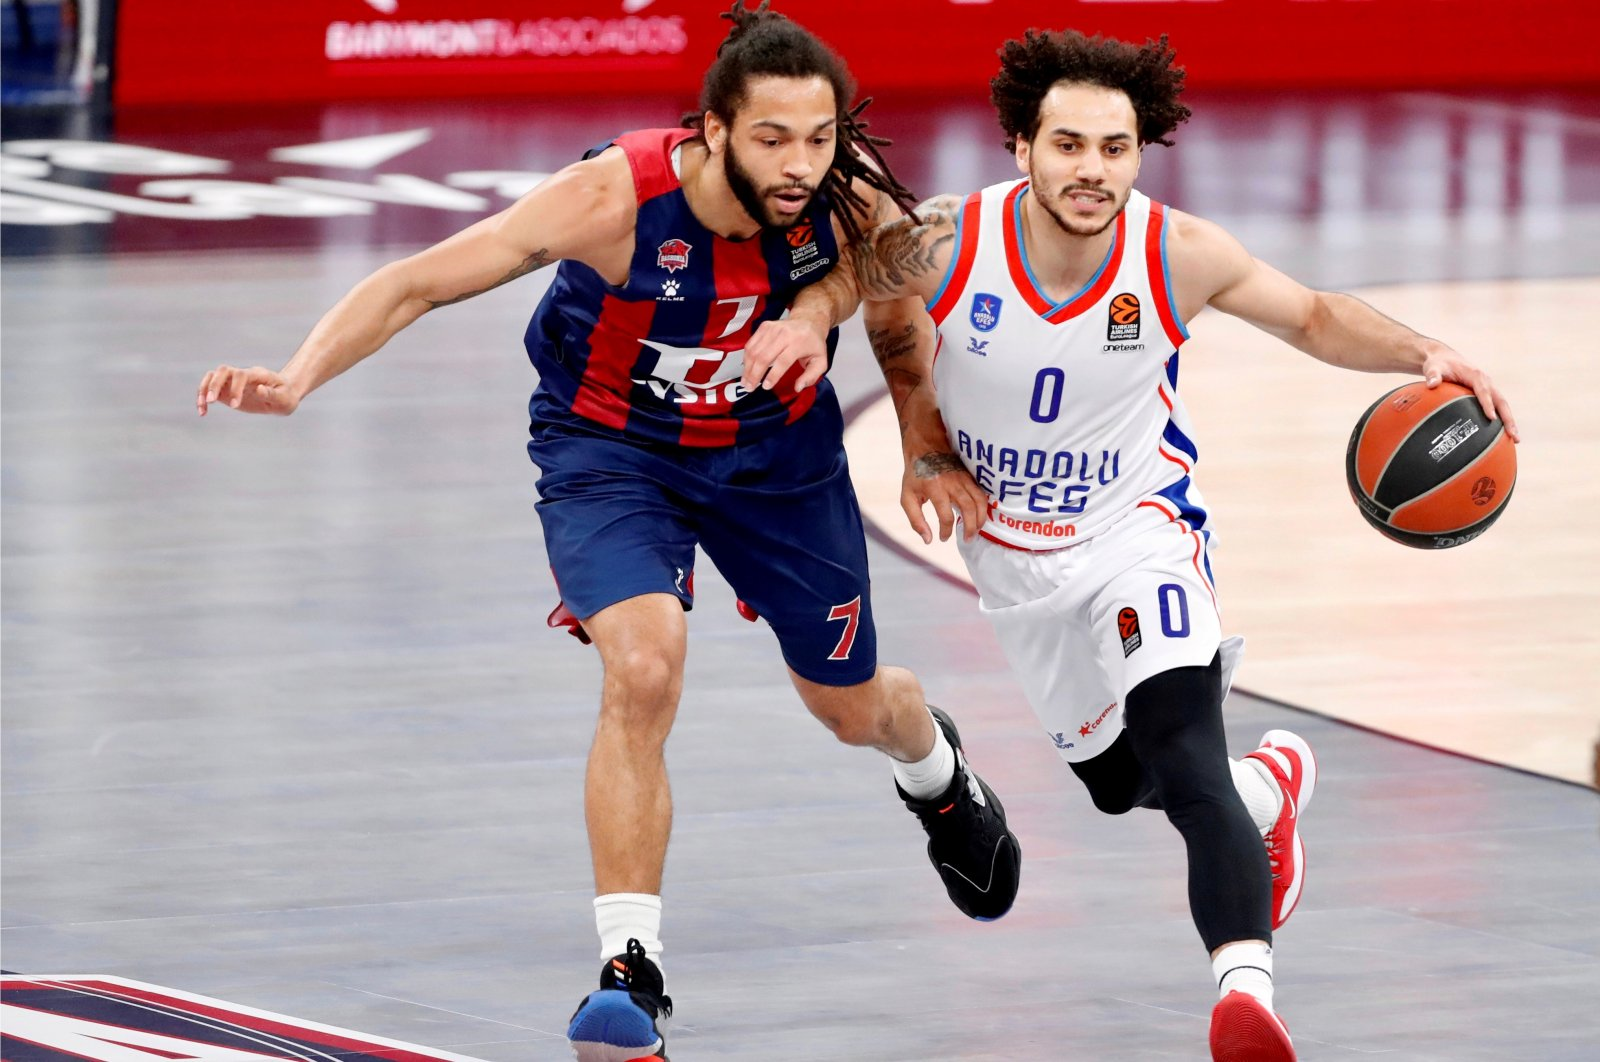 Baskonia's guard Pierria Henry (L) defends Anadolu Efes guard Shane Larkin (R) during a Euroleague basketball game at Fernando Buesa Arena in Vitoria, Basque Country, Spain, April 1, 2021. (EPA Photo)